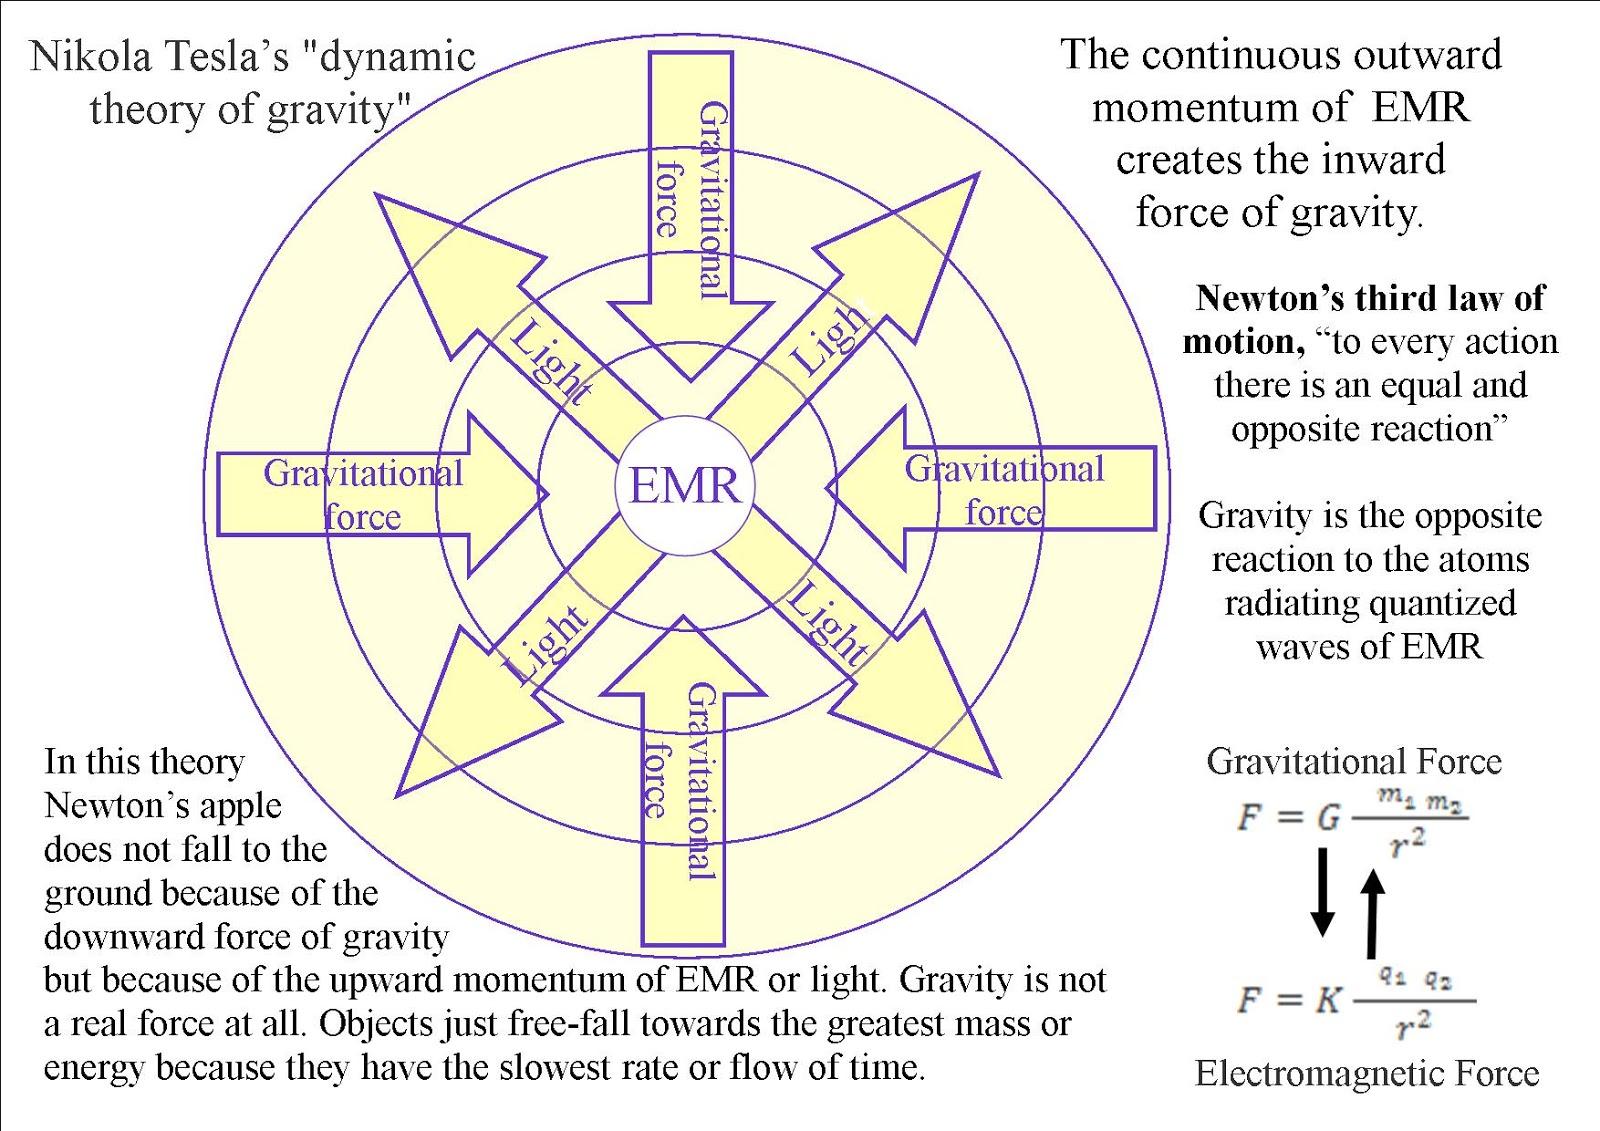 EMR sphere gravity 4